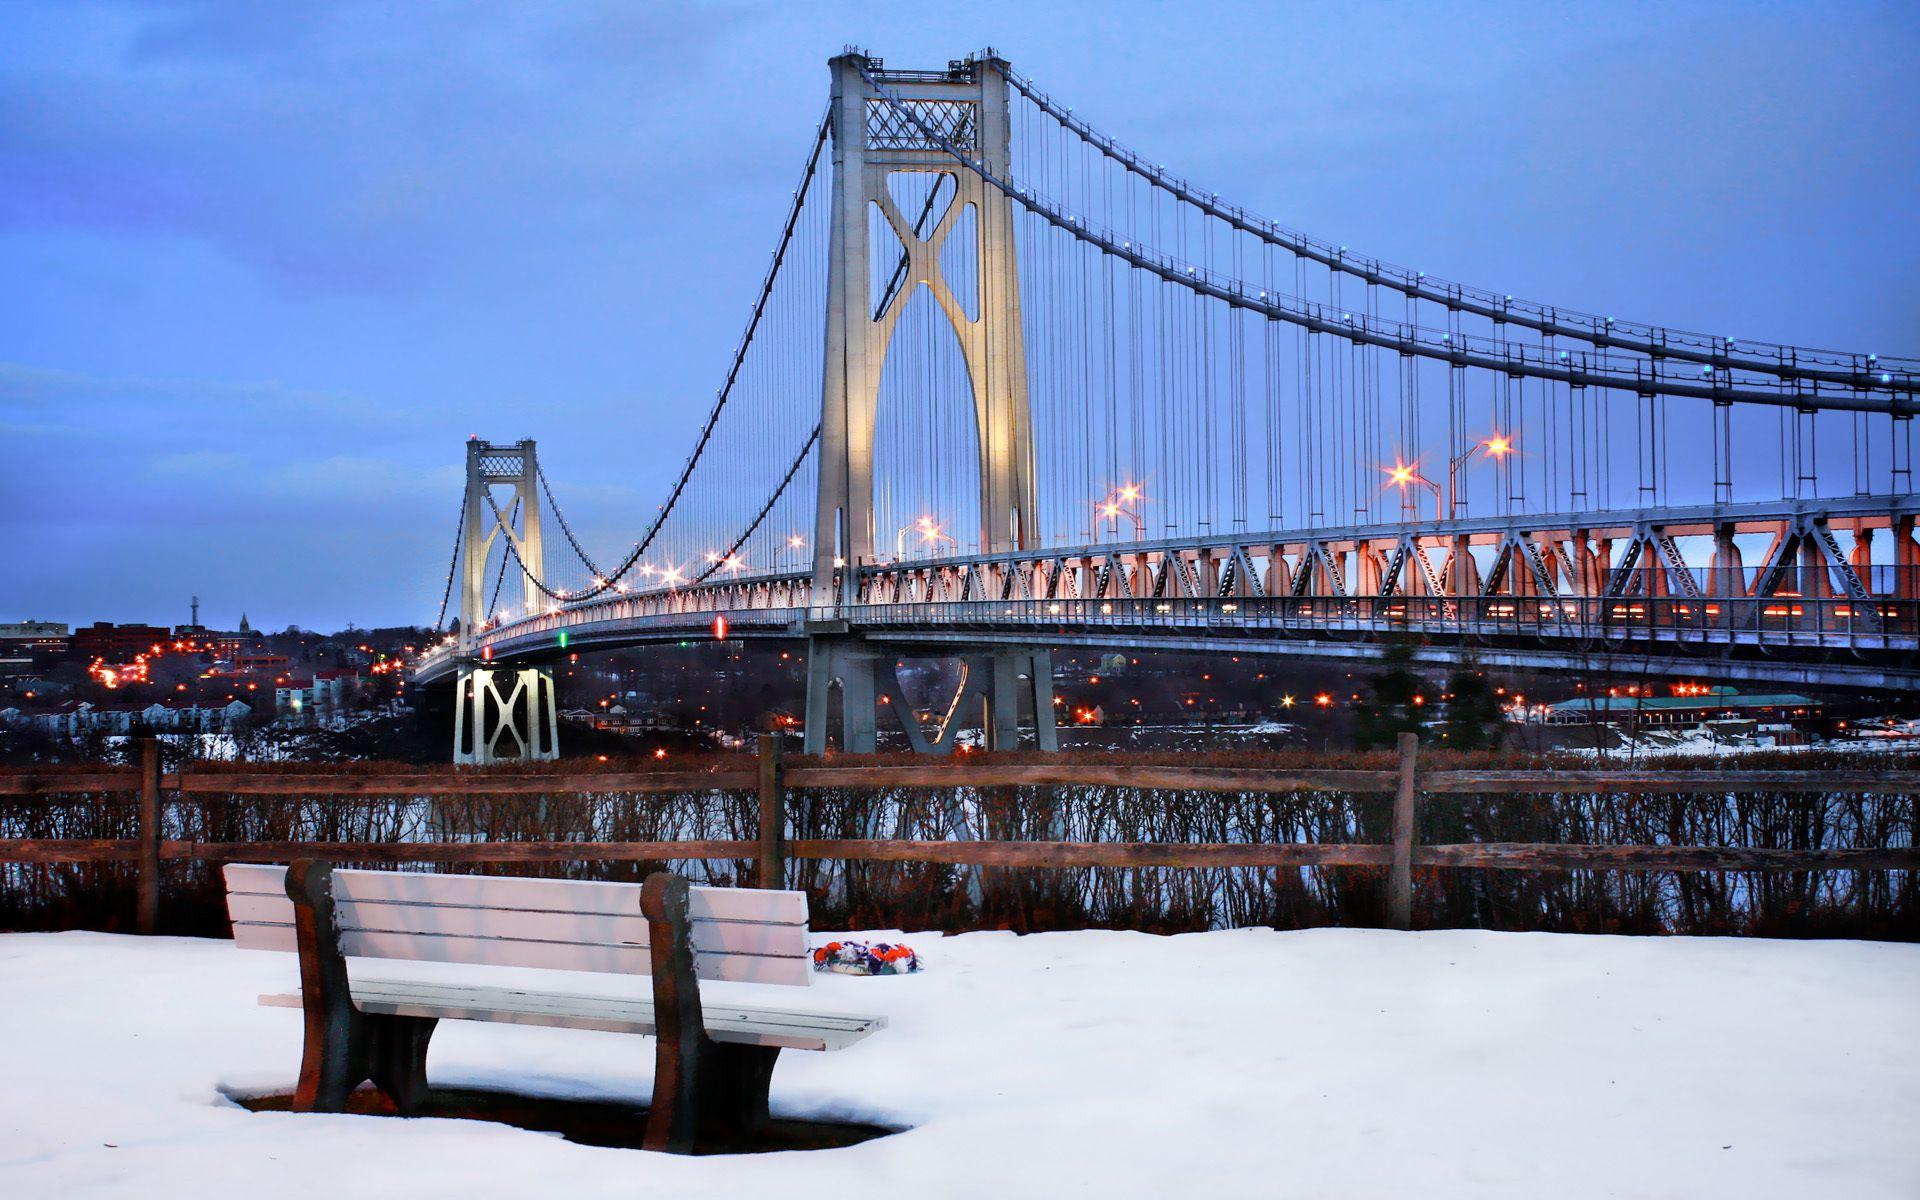 New York Nature Google Search Bridge City New York Snow New York Winter